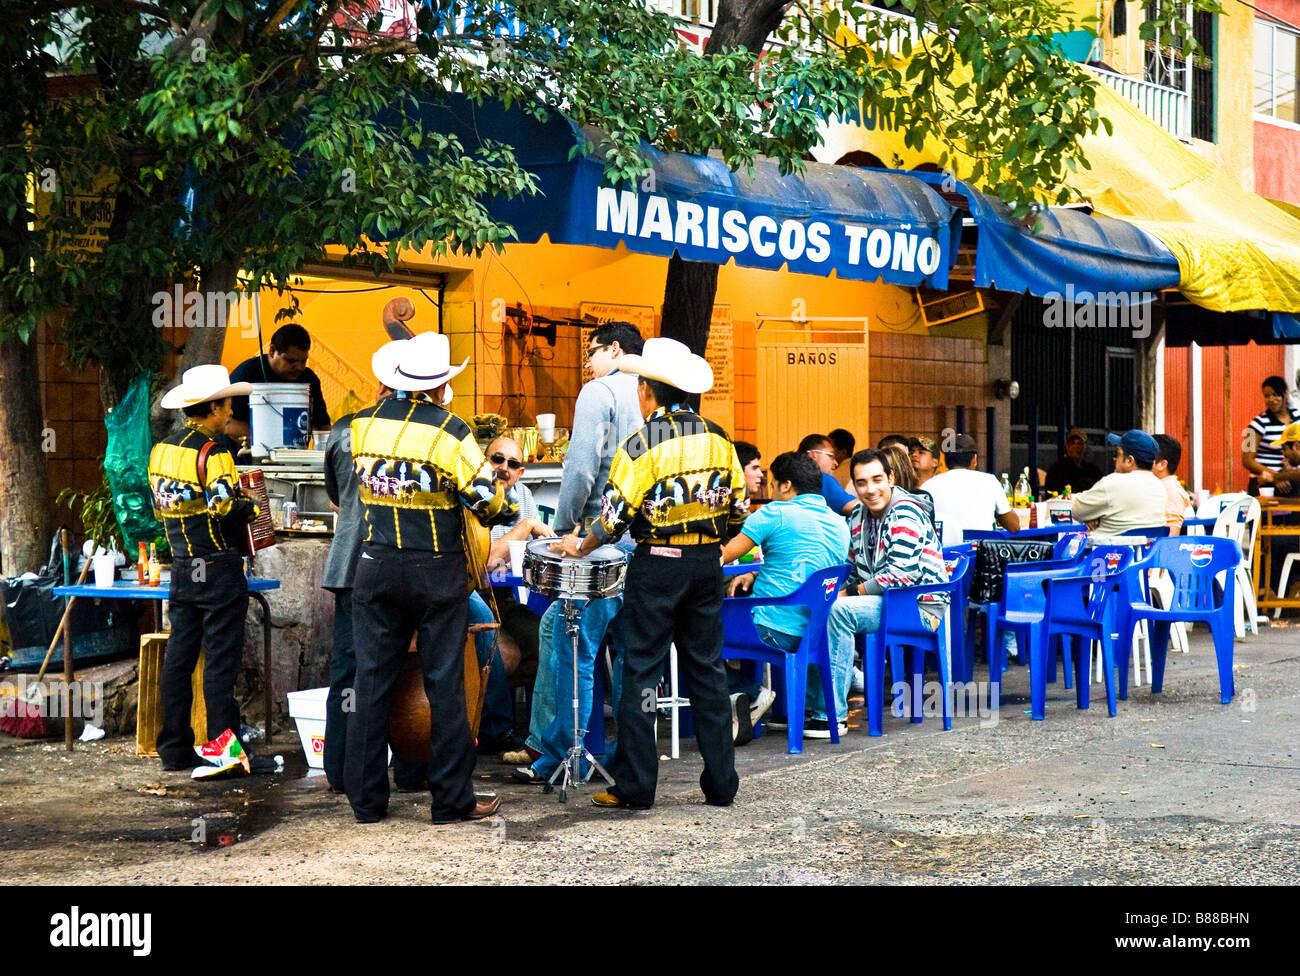 Mariachi band at sidewalk cafe in old town Mazatlan Sinaloa Mexico - Stock Image